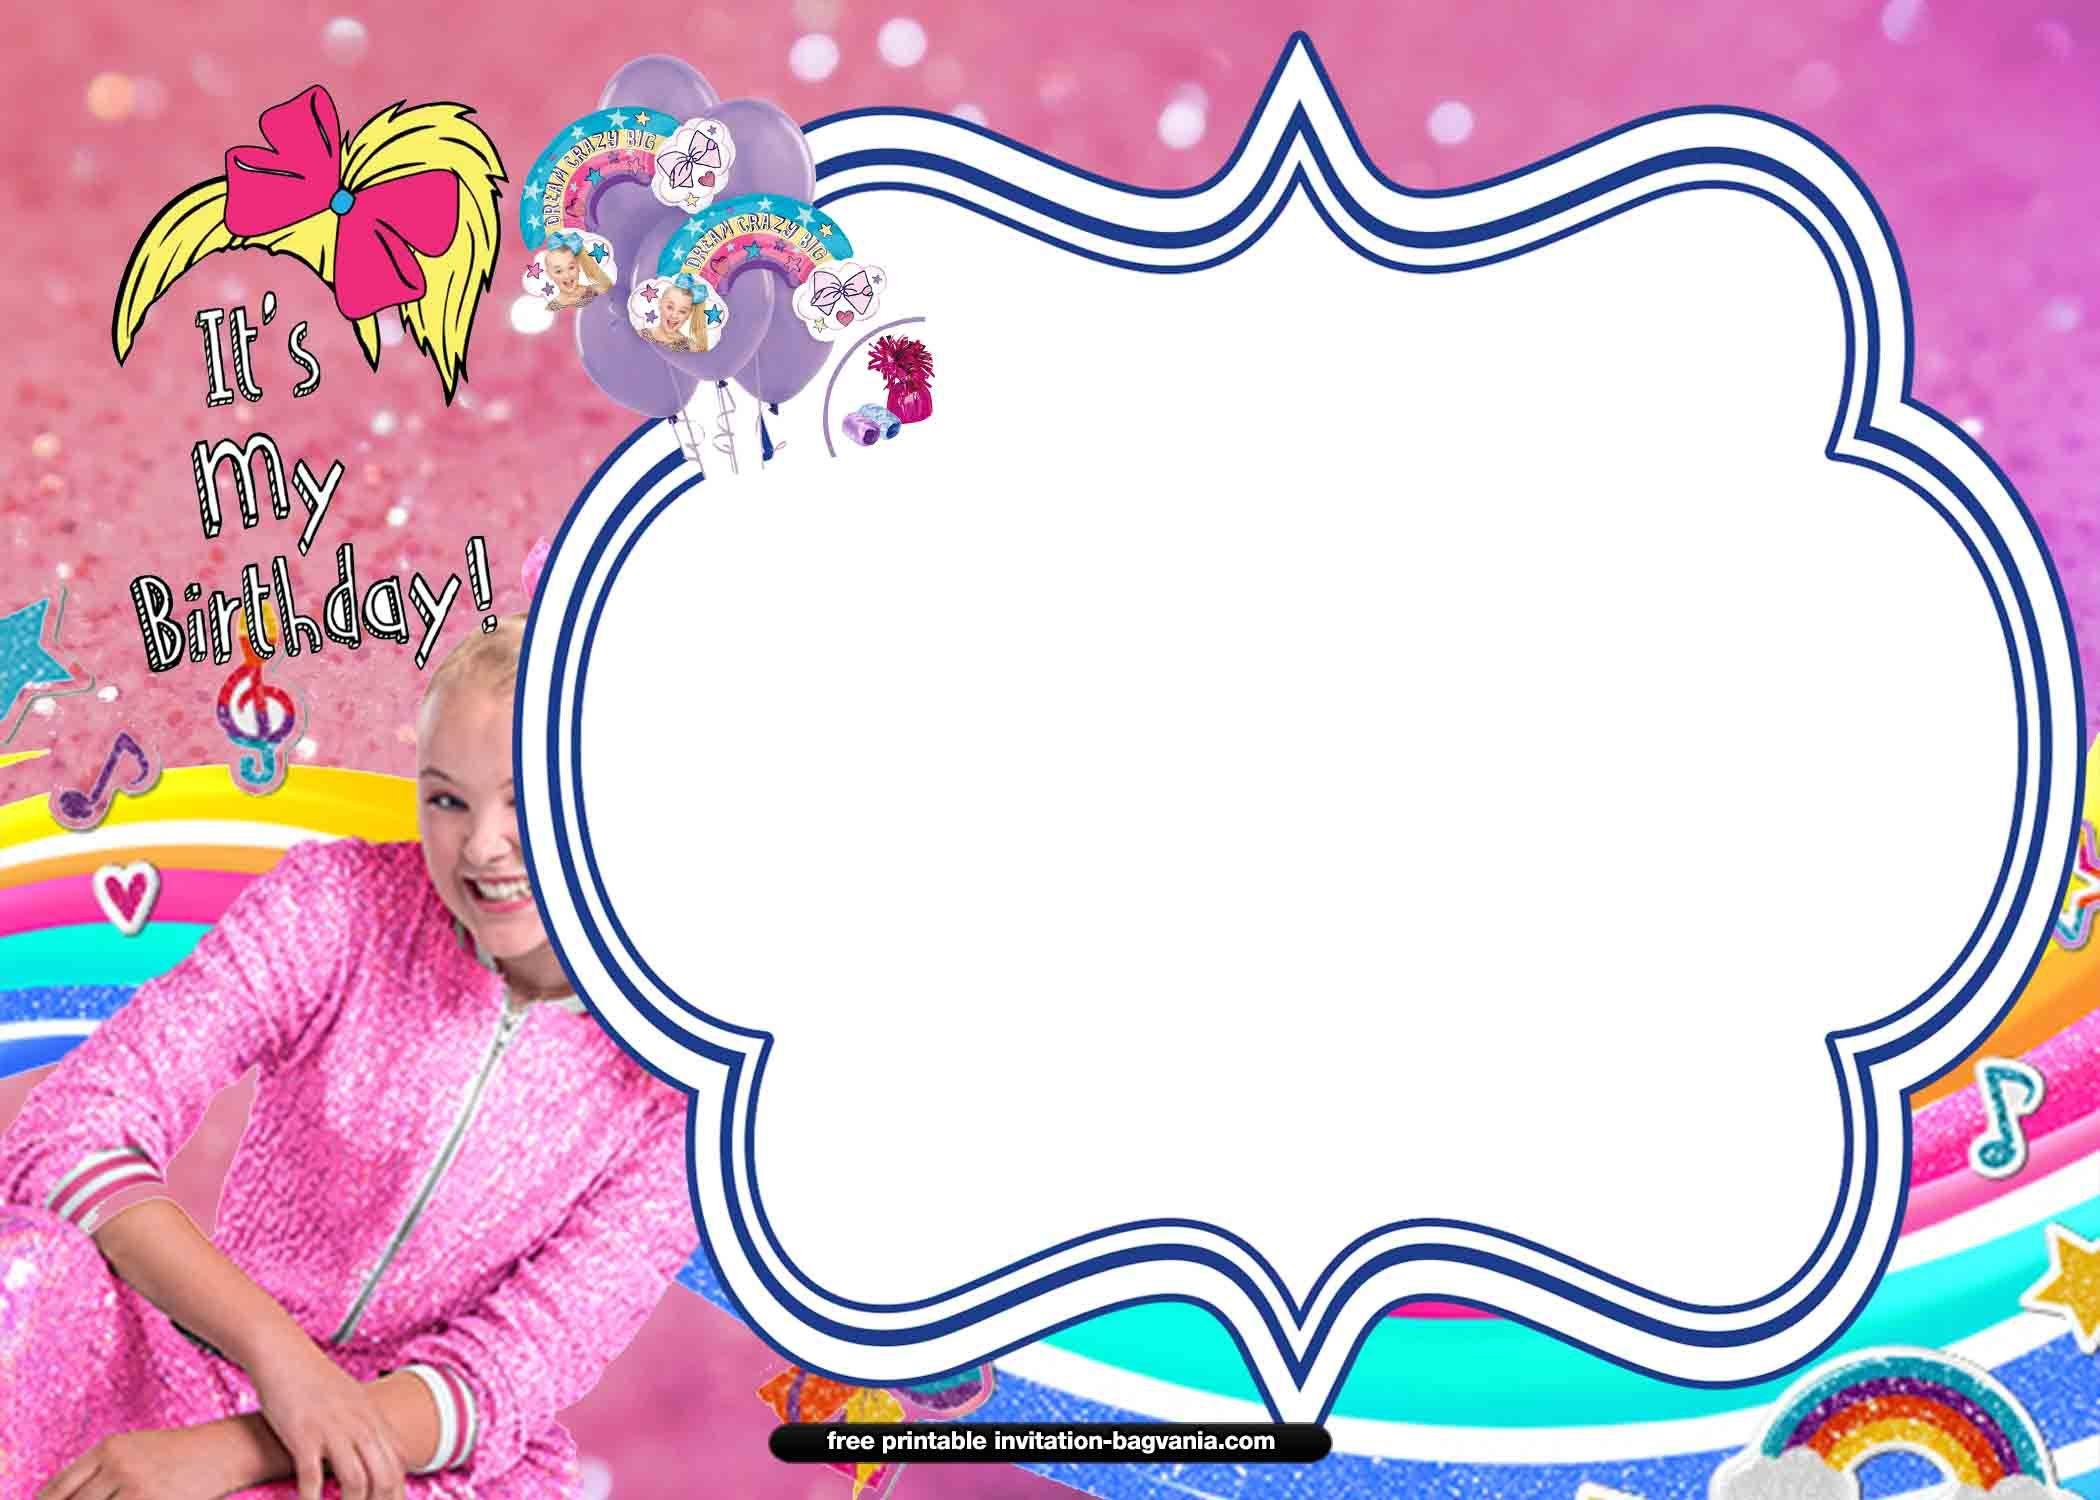 13 Free Jojo Siwa Invitation Templates Free Printable Birthday Invitations Printable Birthday Invitations Jojo Siwa Birthday